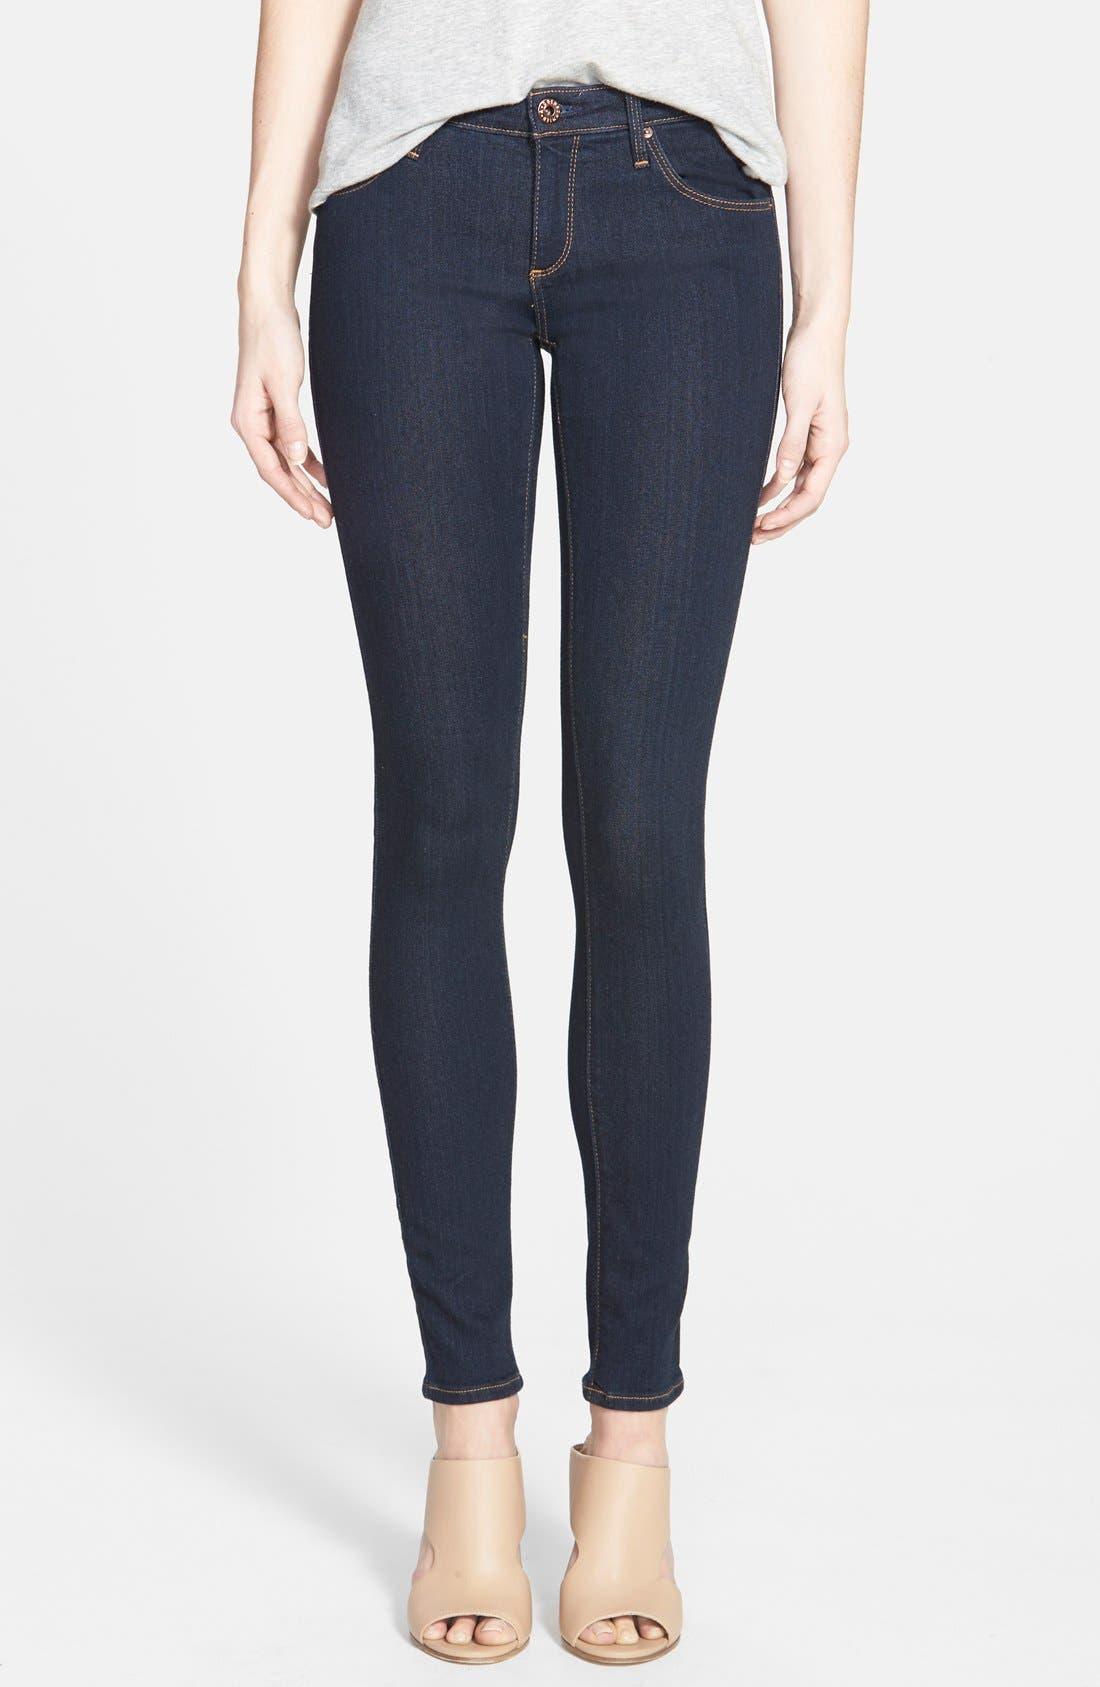 Alternate Image 1 Selected - AG Jeans Super Skinny Stretch Jeans (Delight)